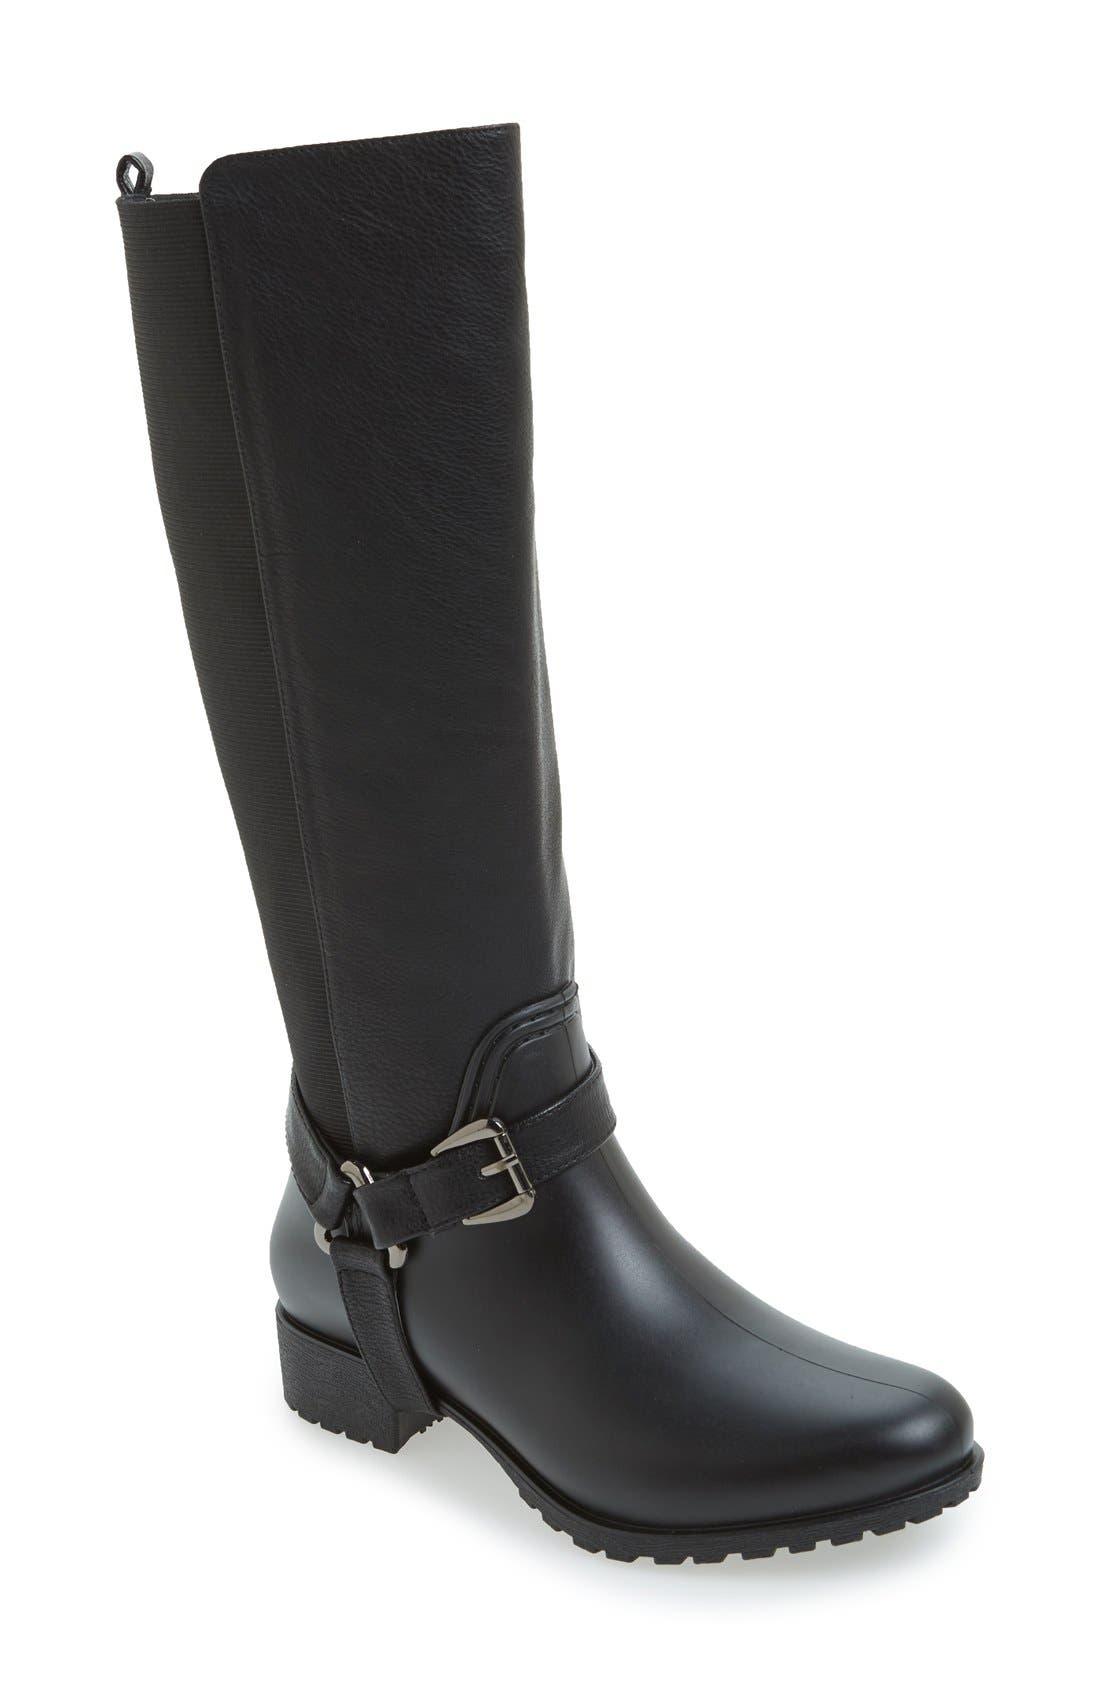 Main Image - däv 'Kingston' Water Resistant Boot (Women)